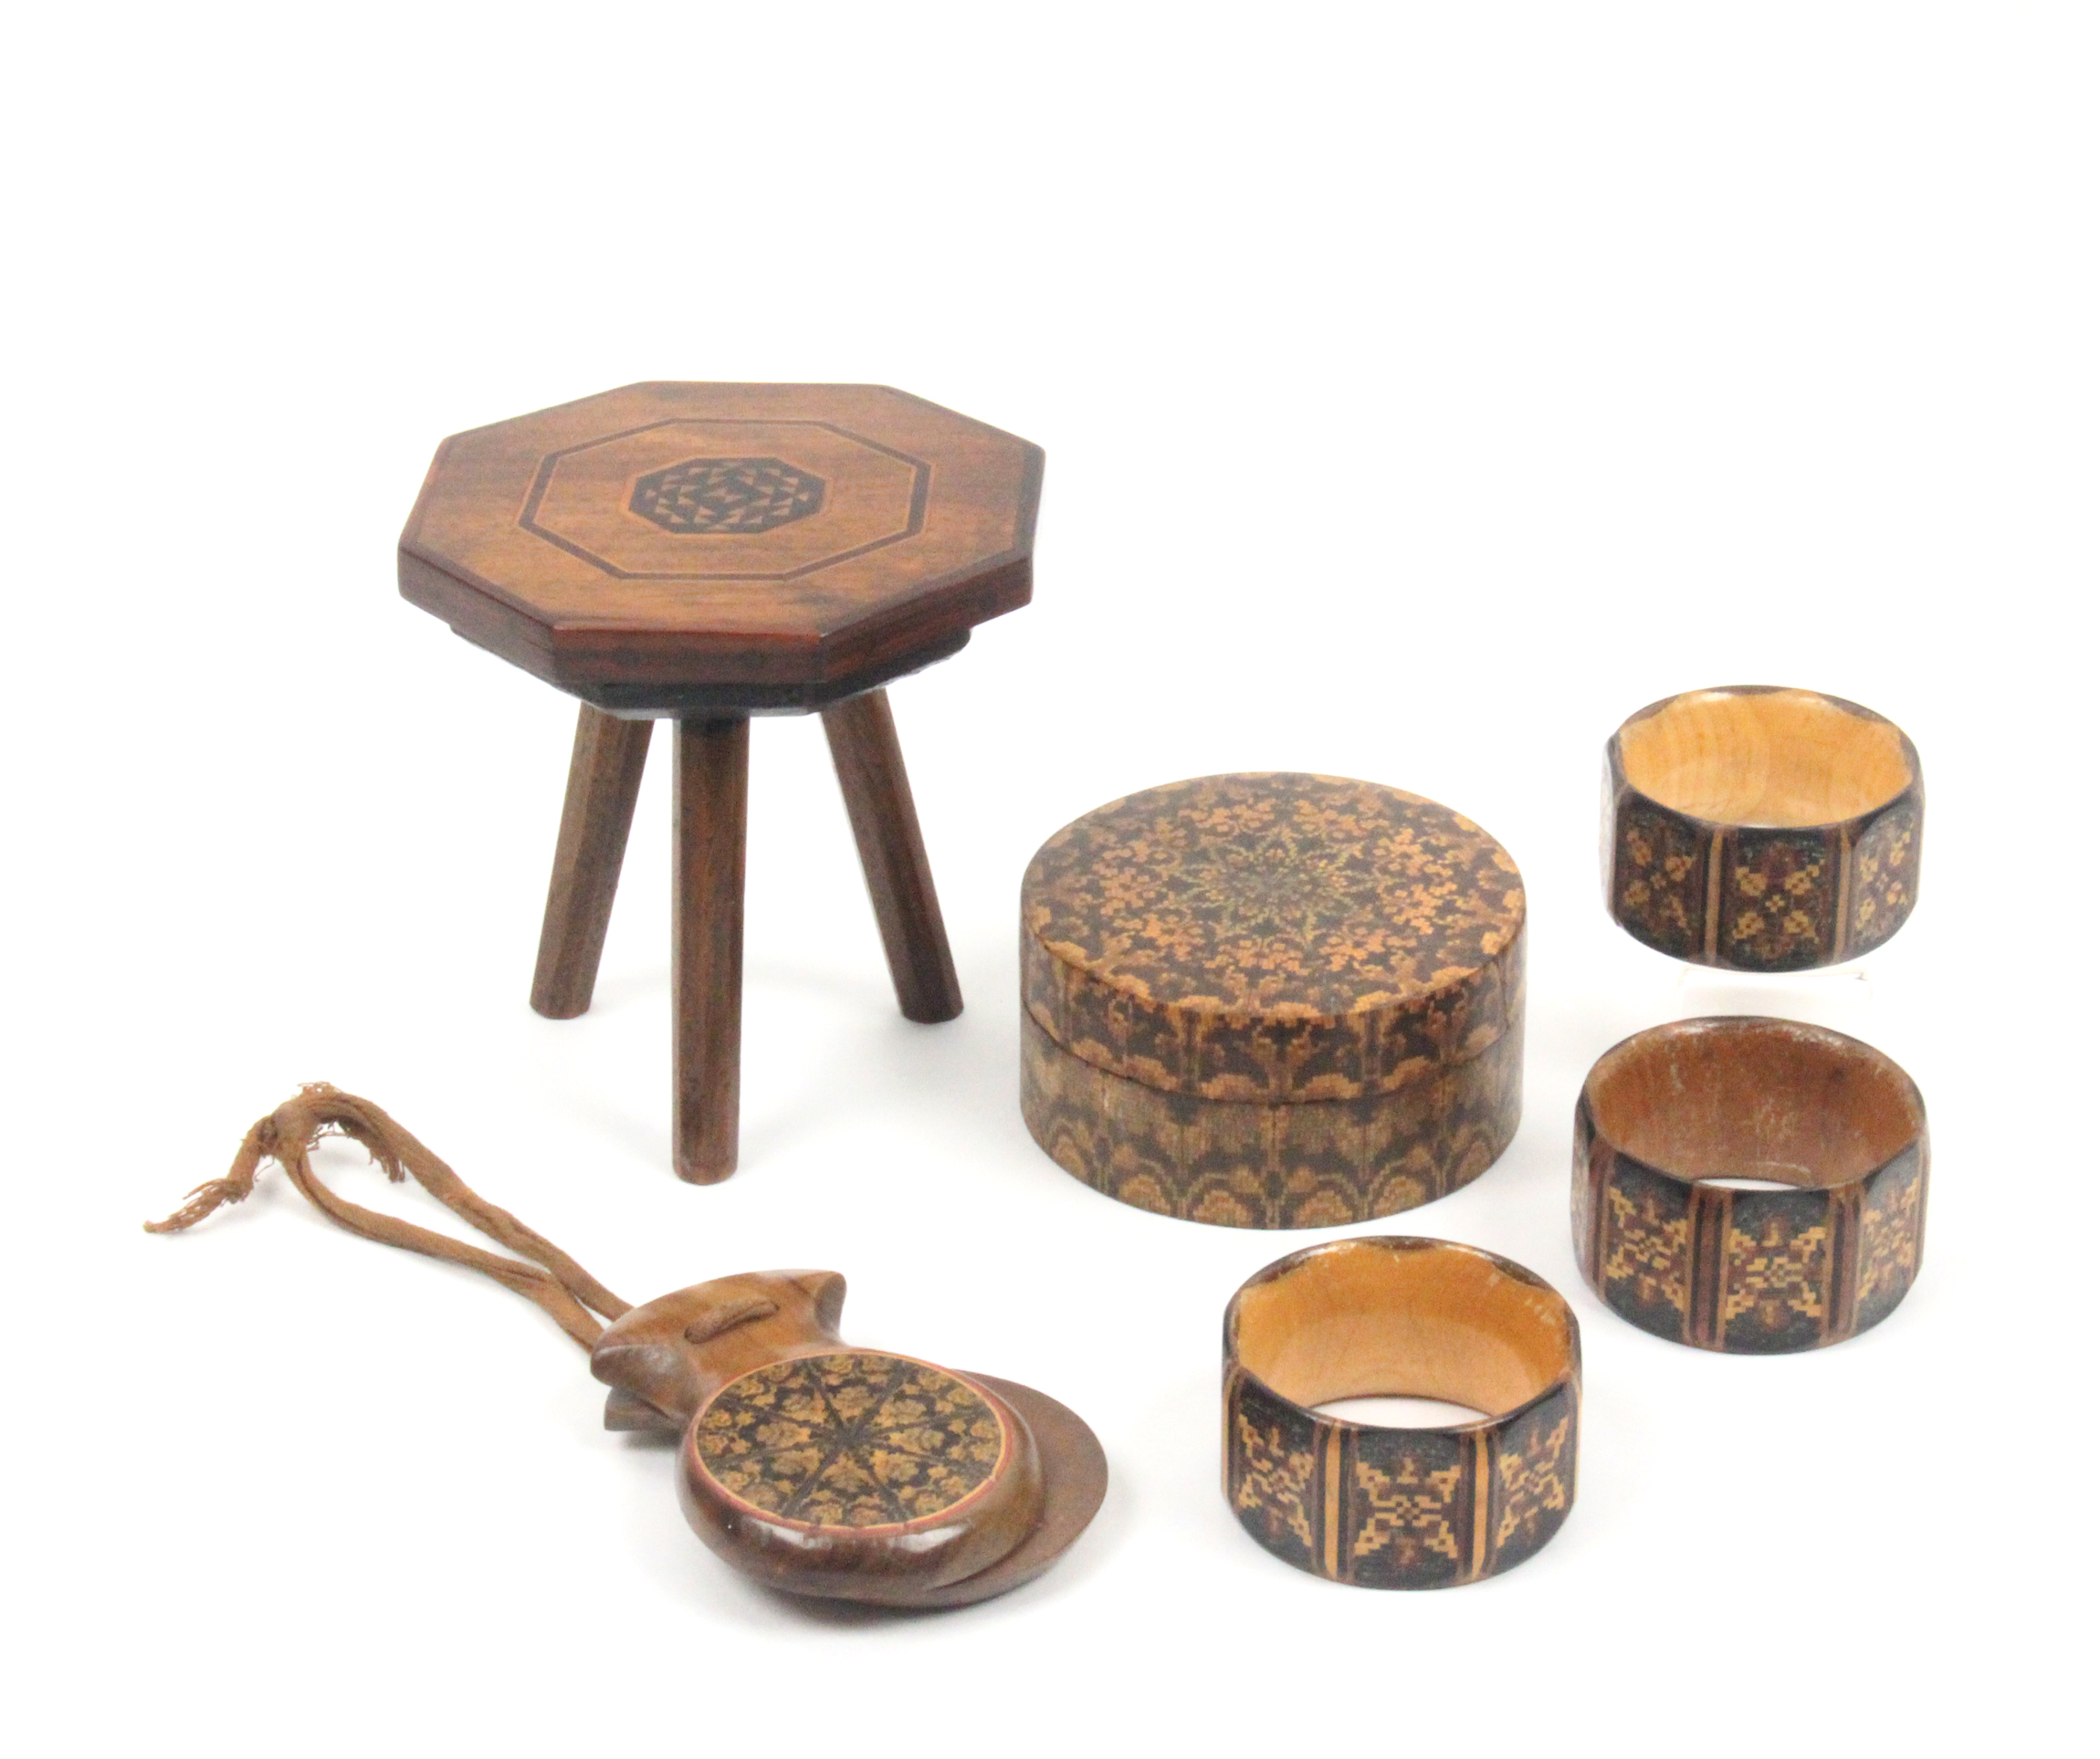 Tunbridge ware and associated wares - six pieces comprising three Tunbridge ware napkin rings of